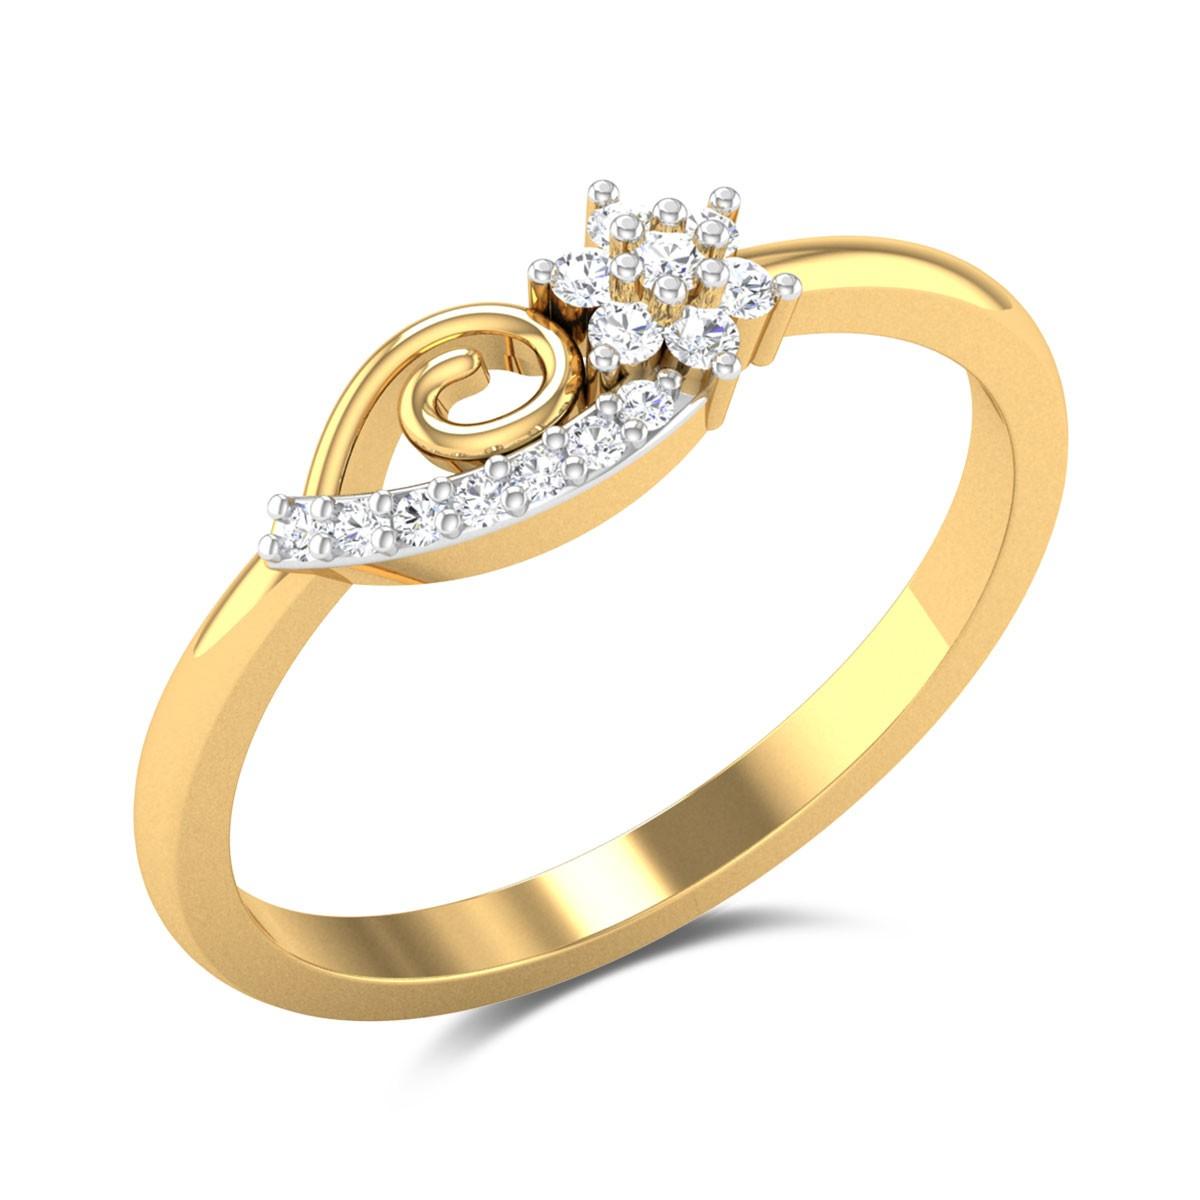 Clancy Diamond Ring